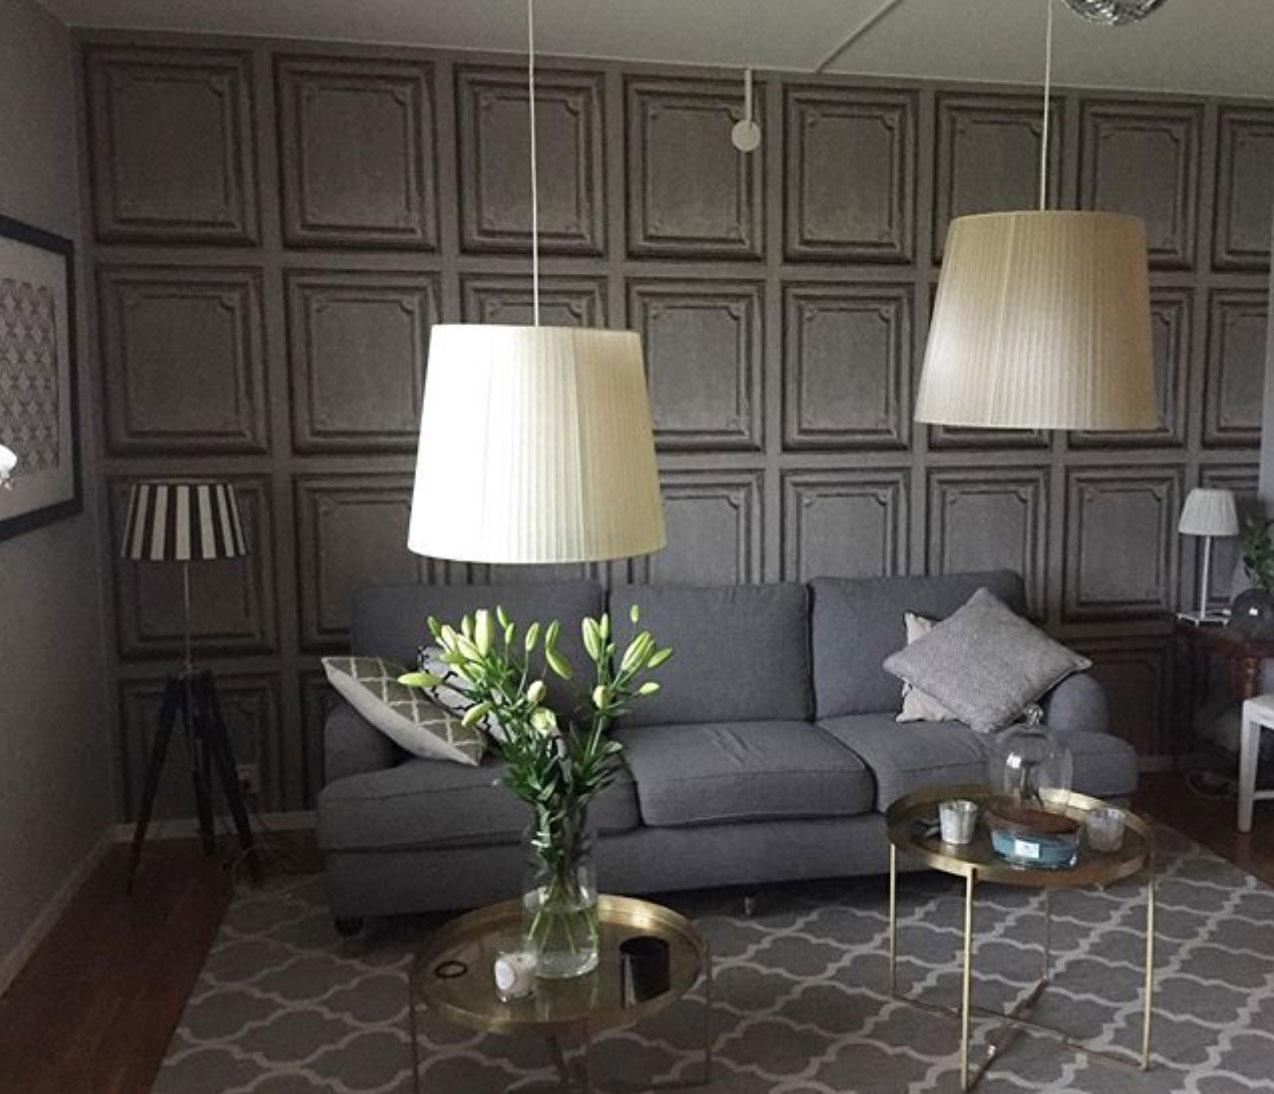 panelväggar vardagsrum träpanel midbec tapeter Im_et Maya